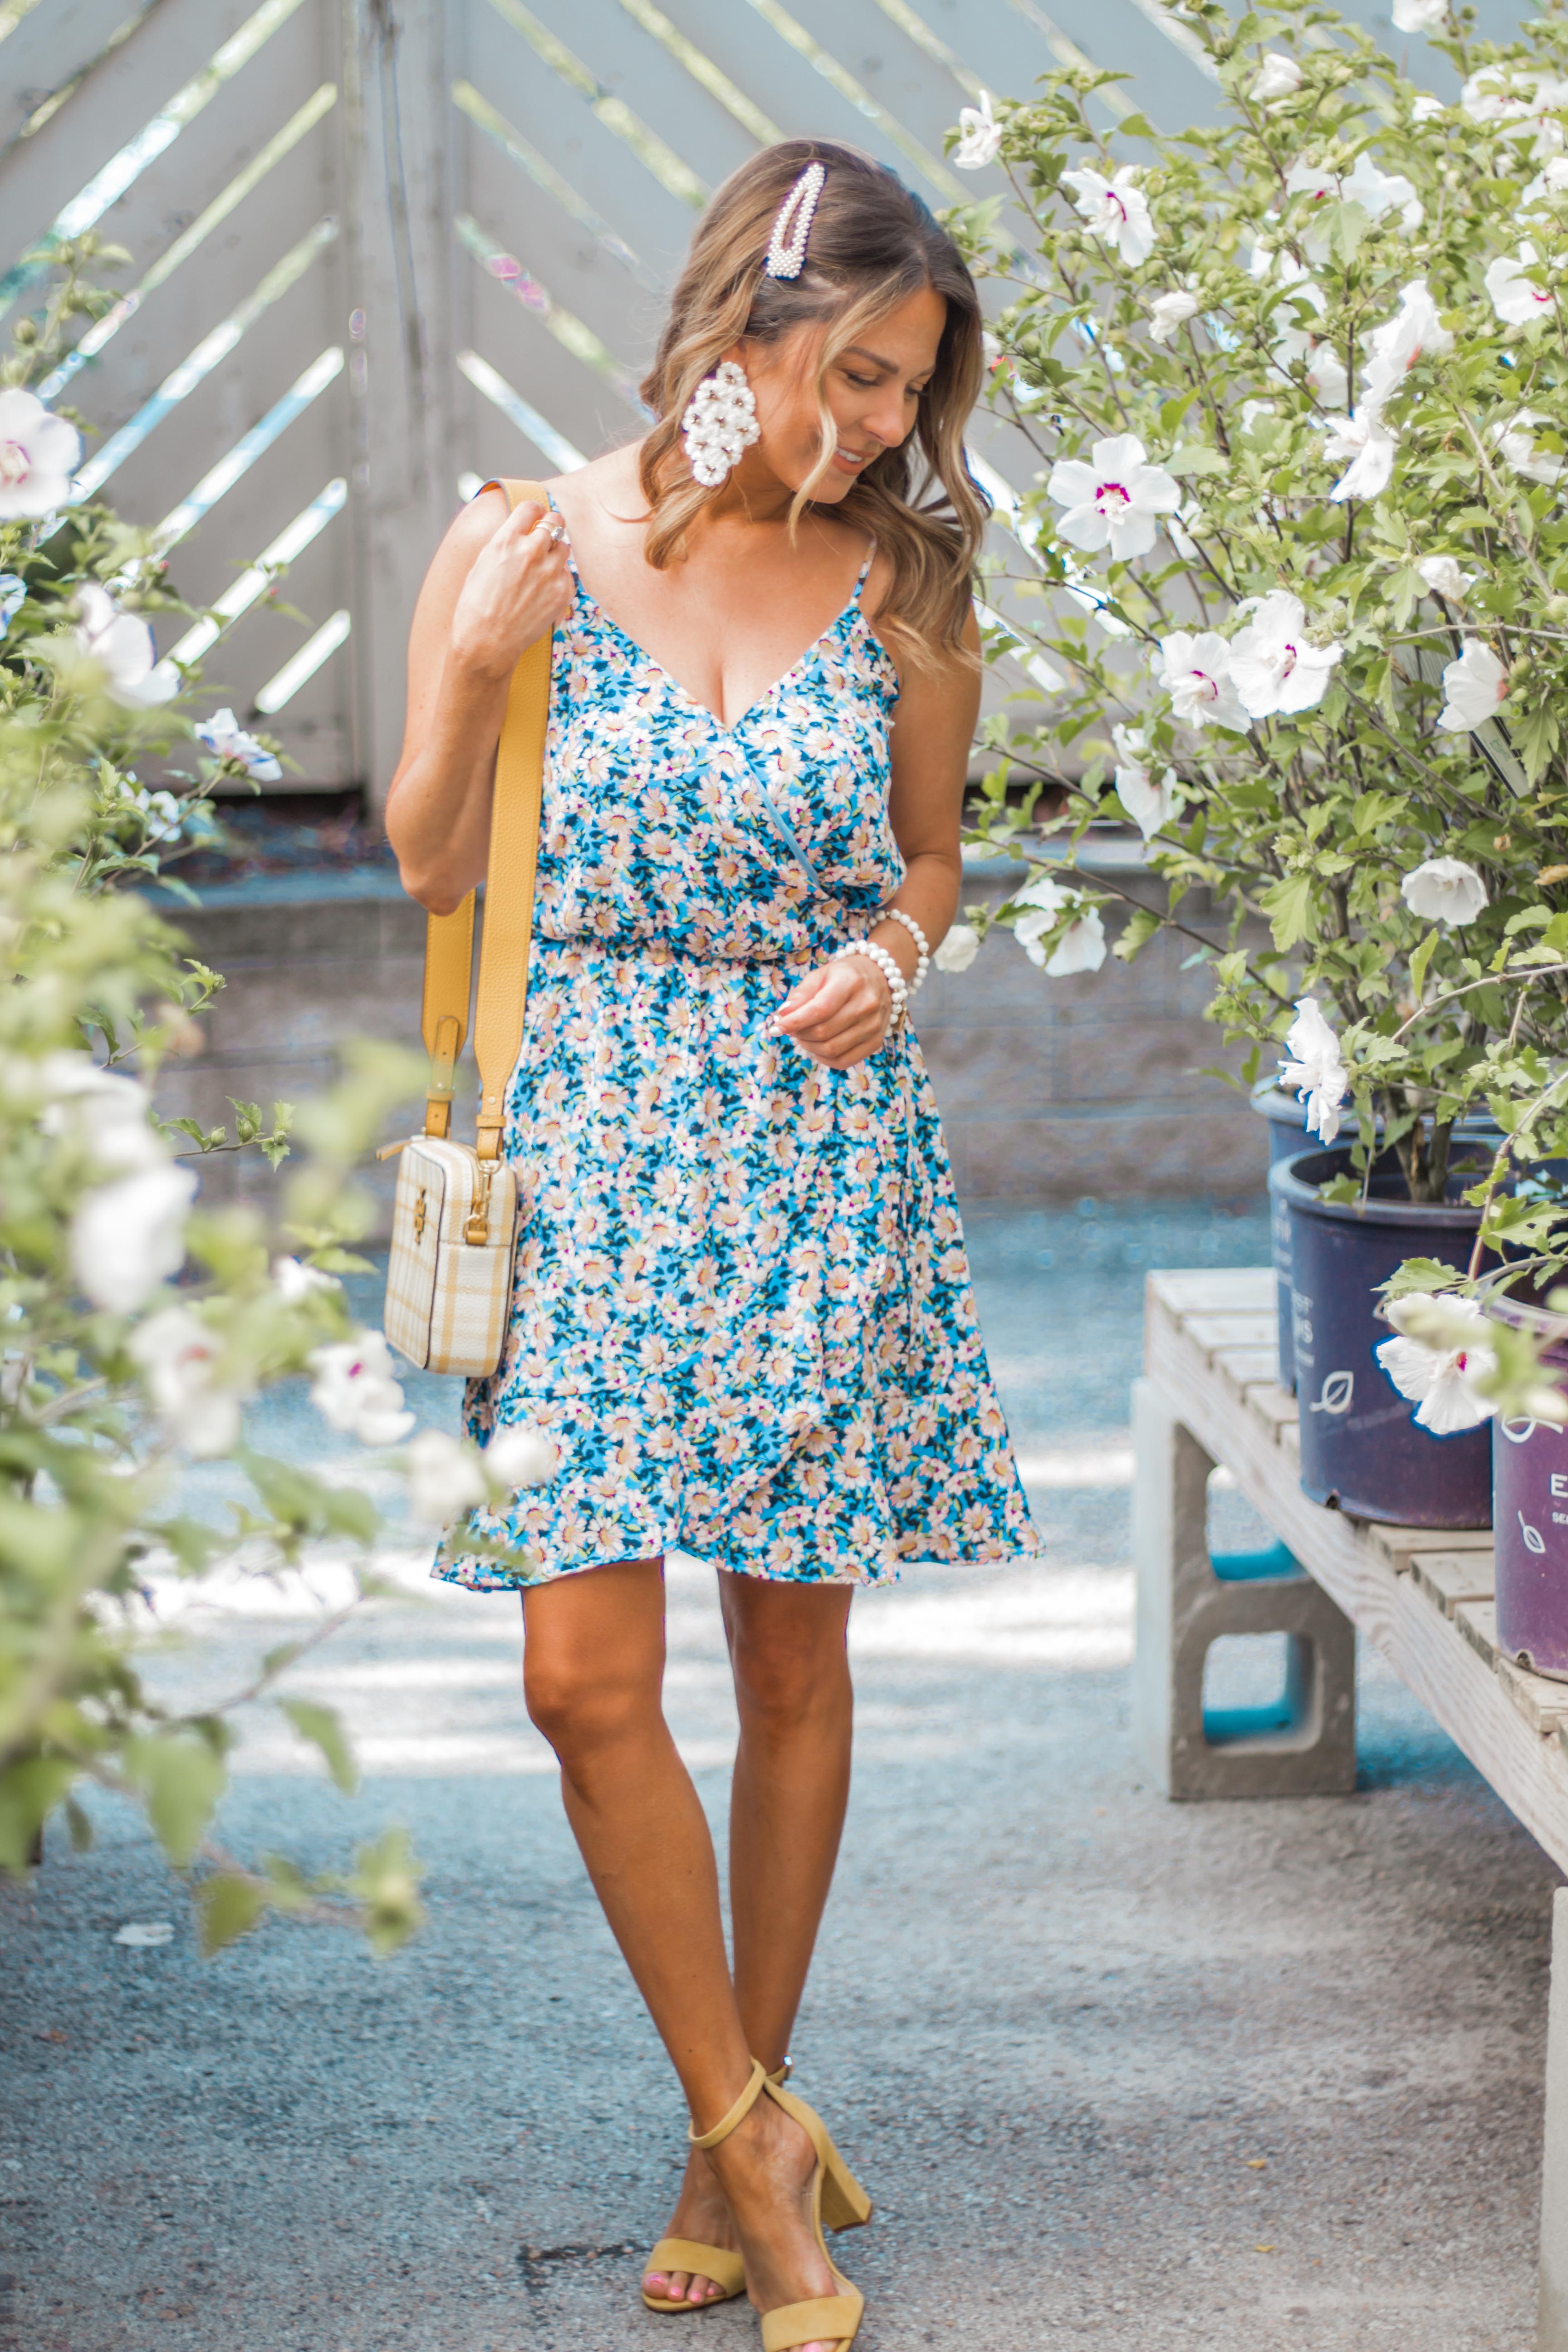 Women's Fashion-Sabby Style-Summer Fashion-Summer Dress-Pearl Barrette-Wide Brim Hat-Hair Accessories-Omaha Blogger-Nebraska Blogger-Colorful Style-Floral Dress-7